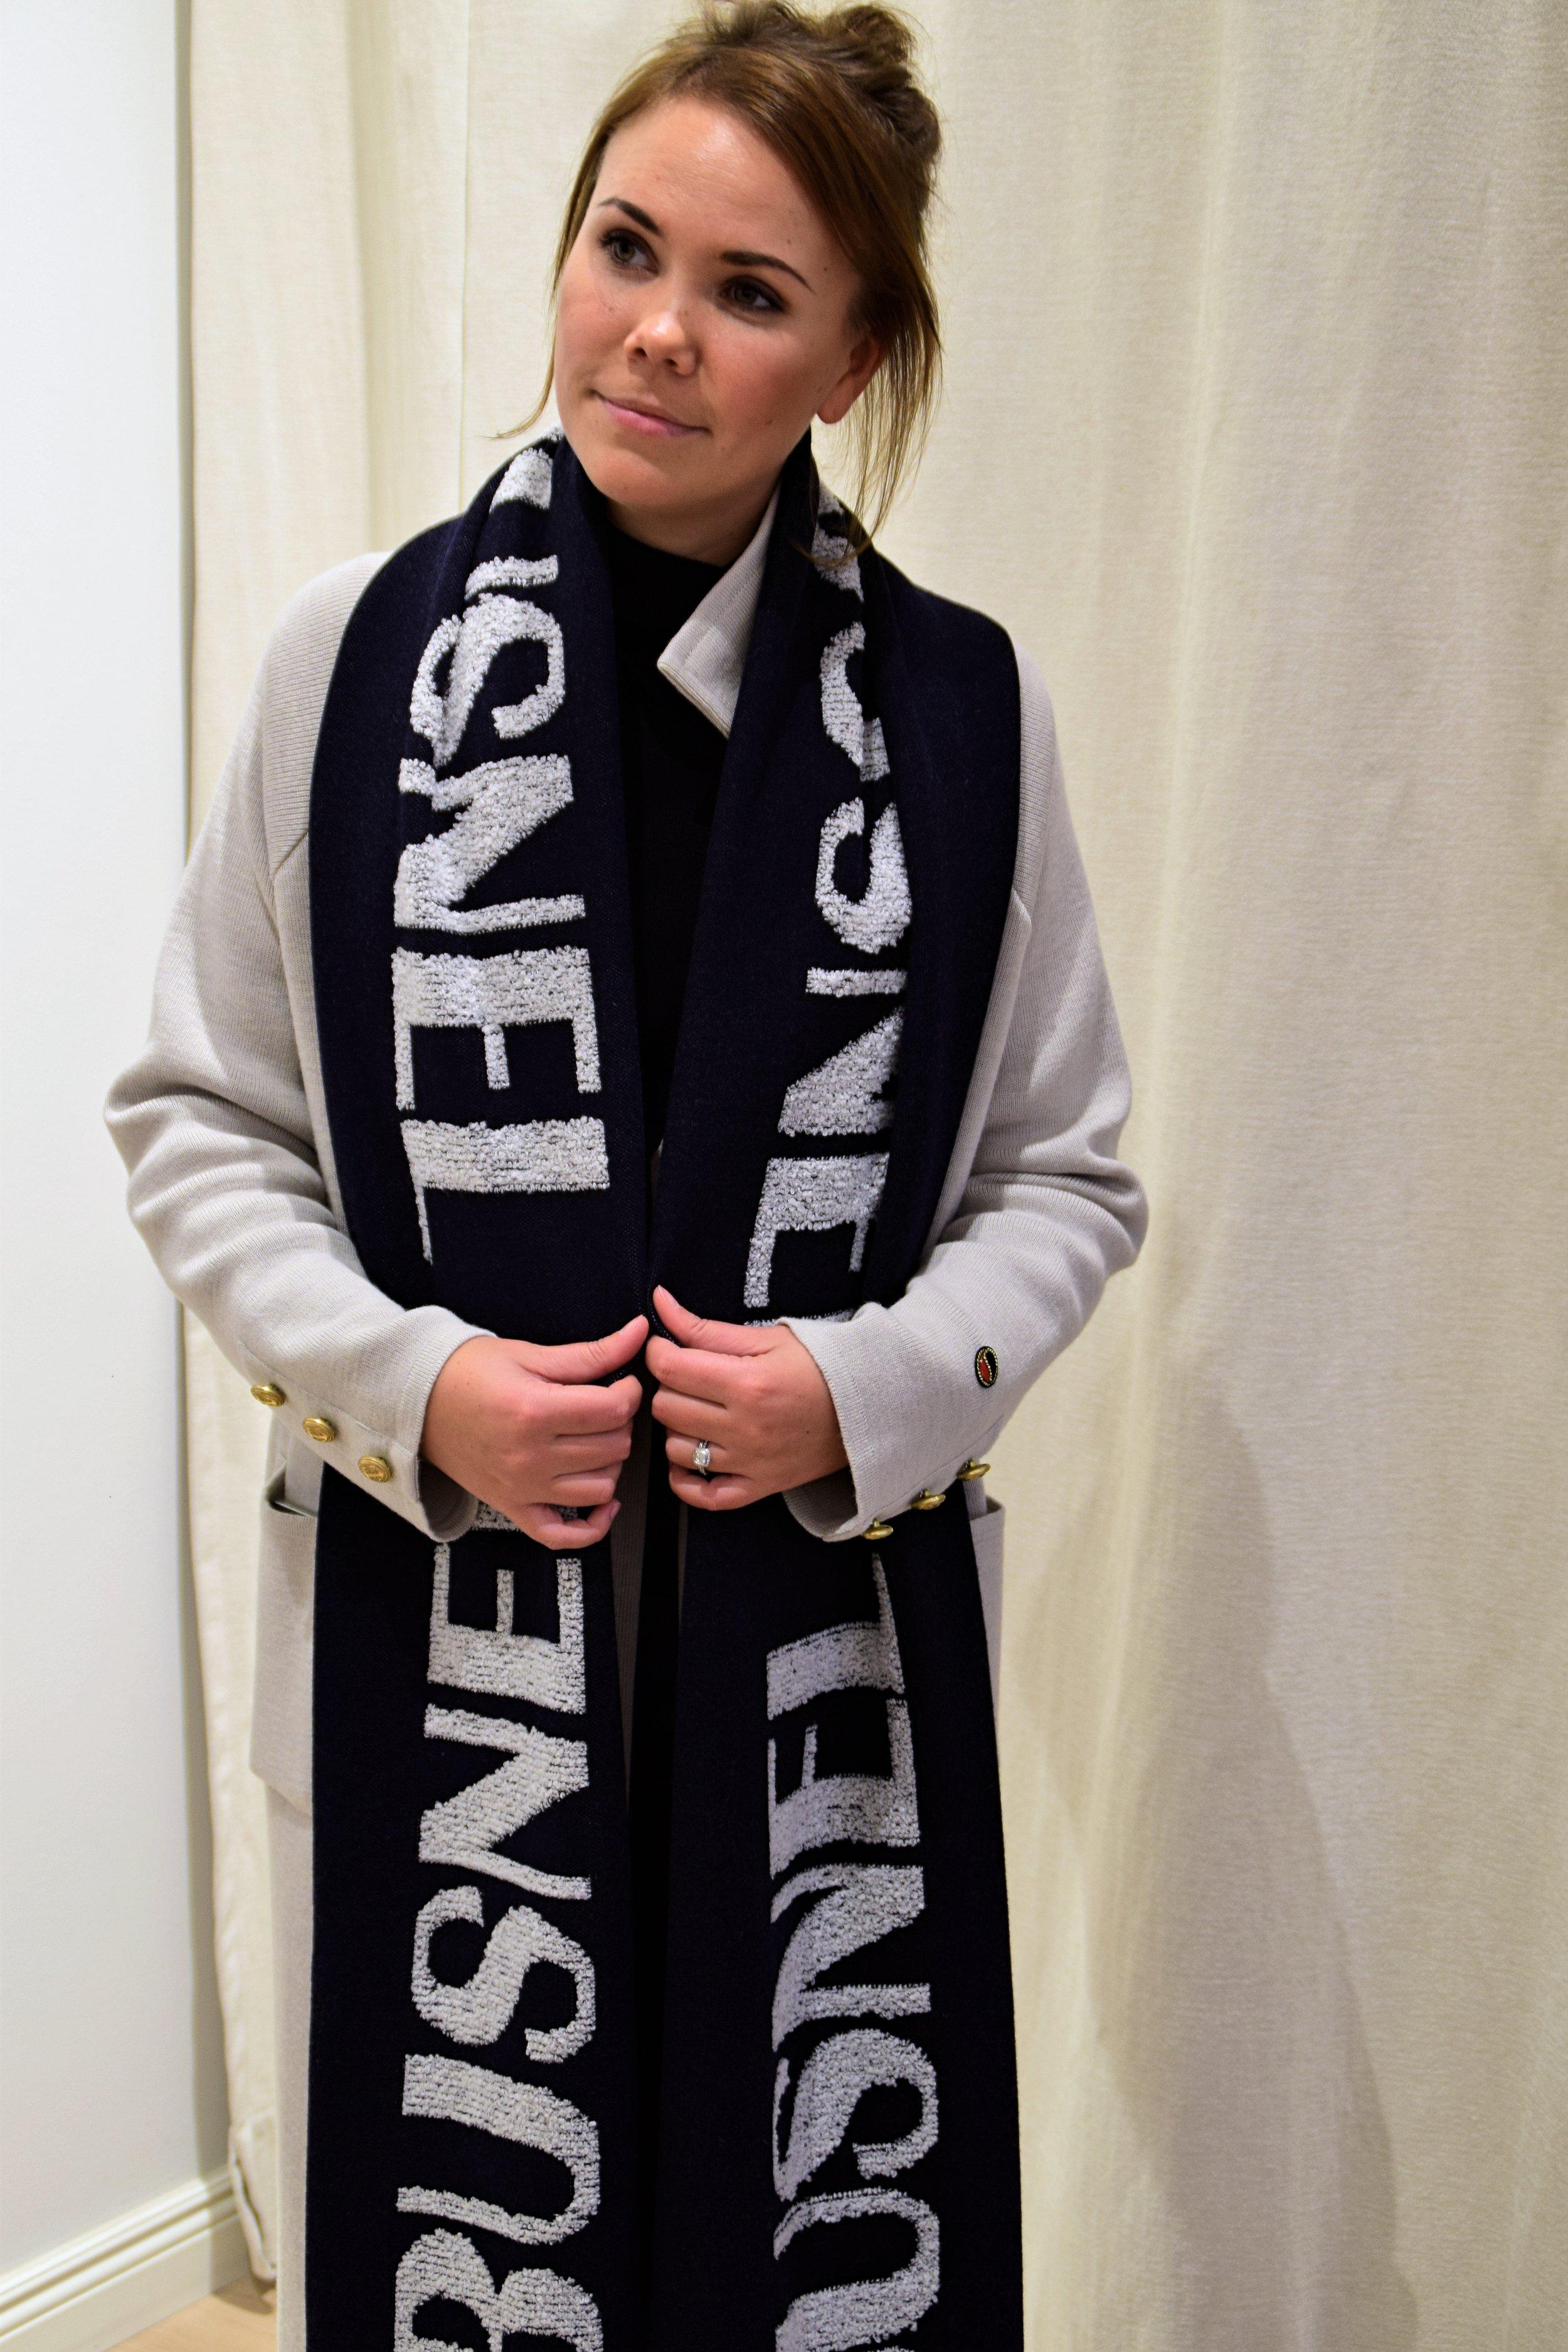 Beaune Scarf & Avignon Jacket, Busnel